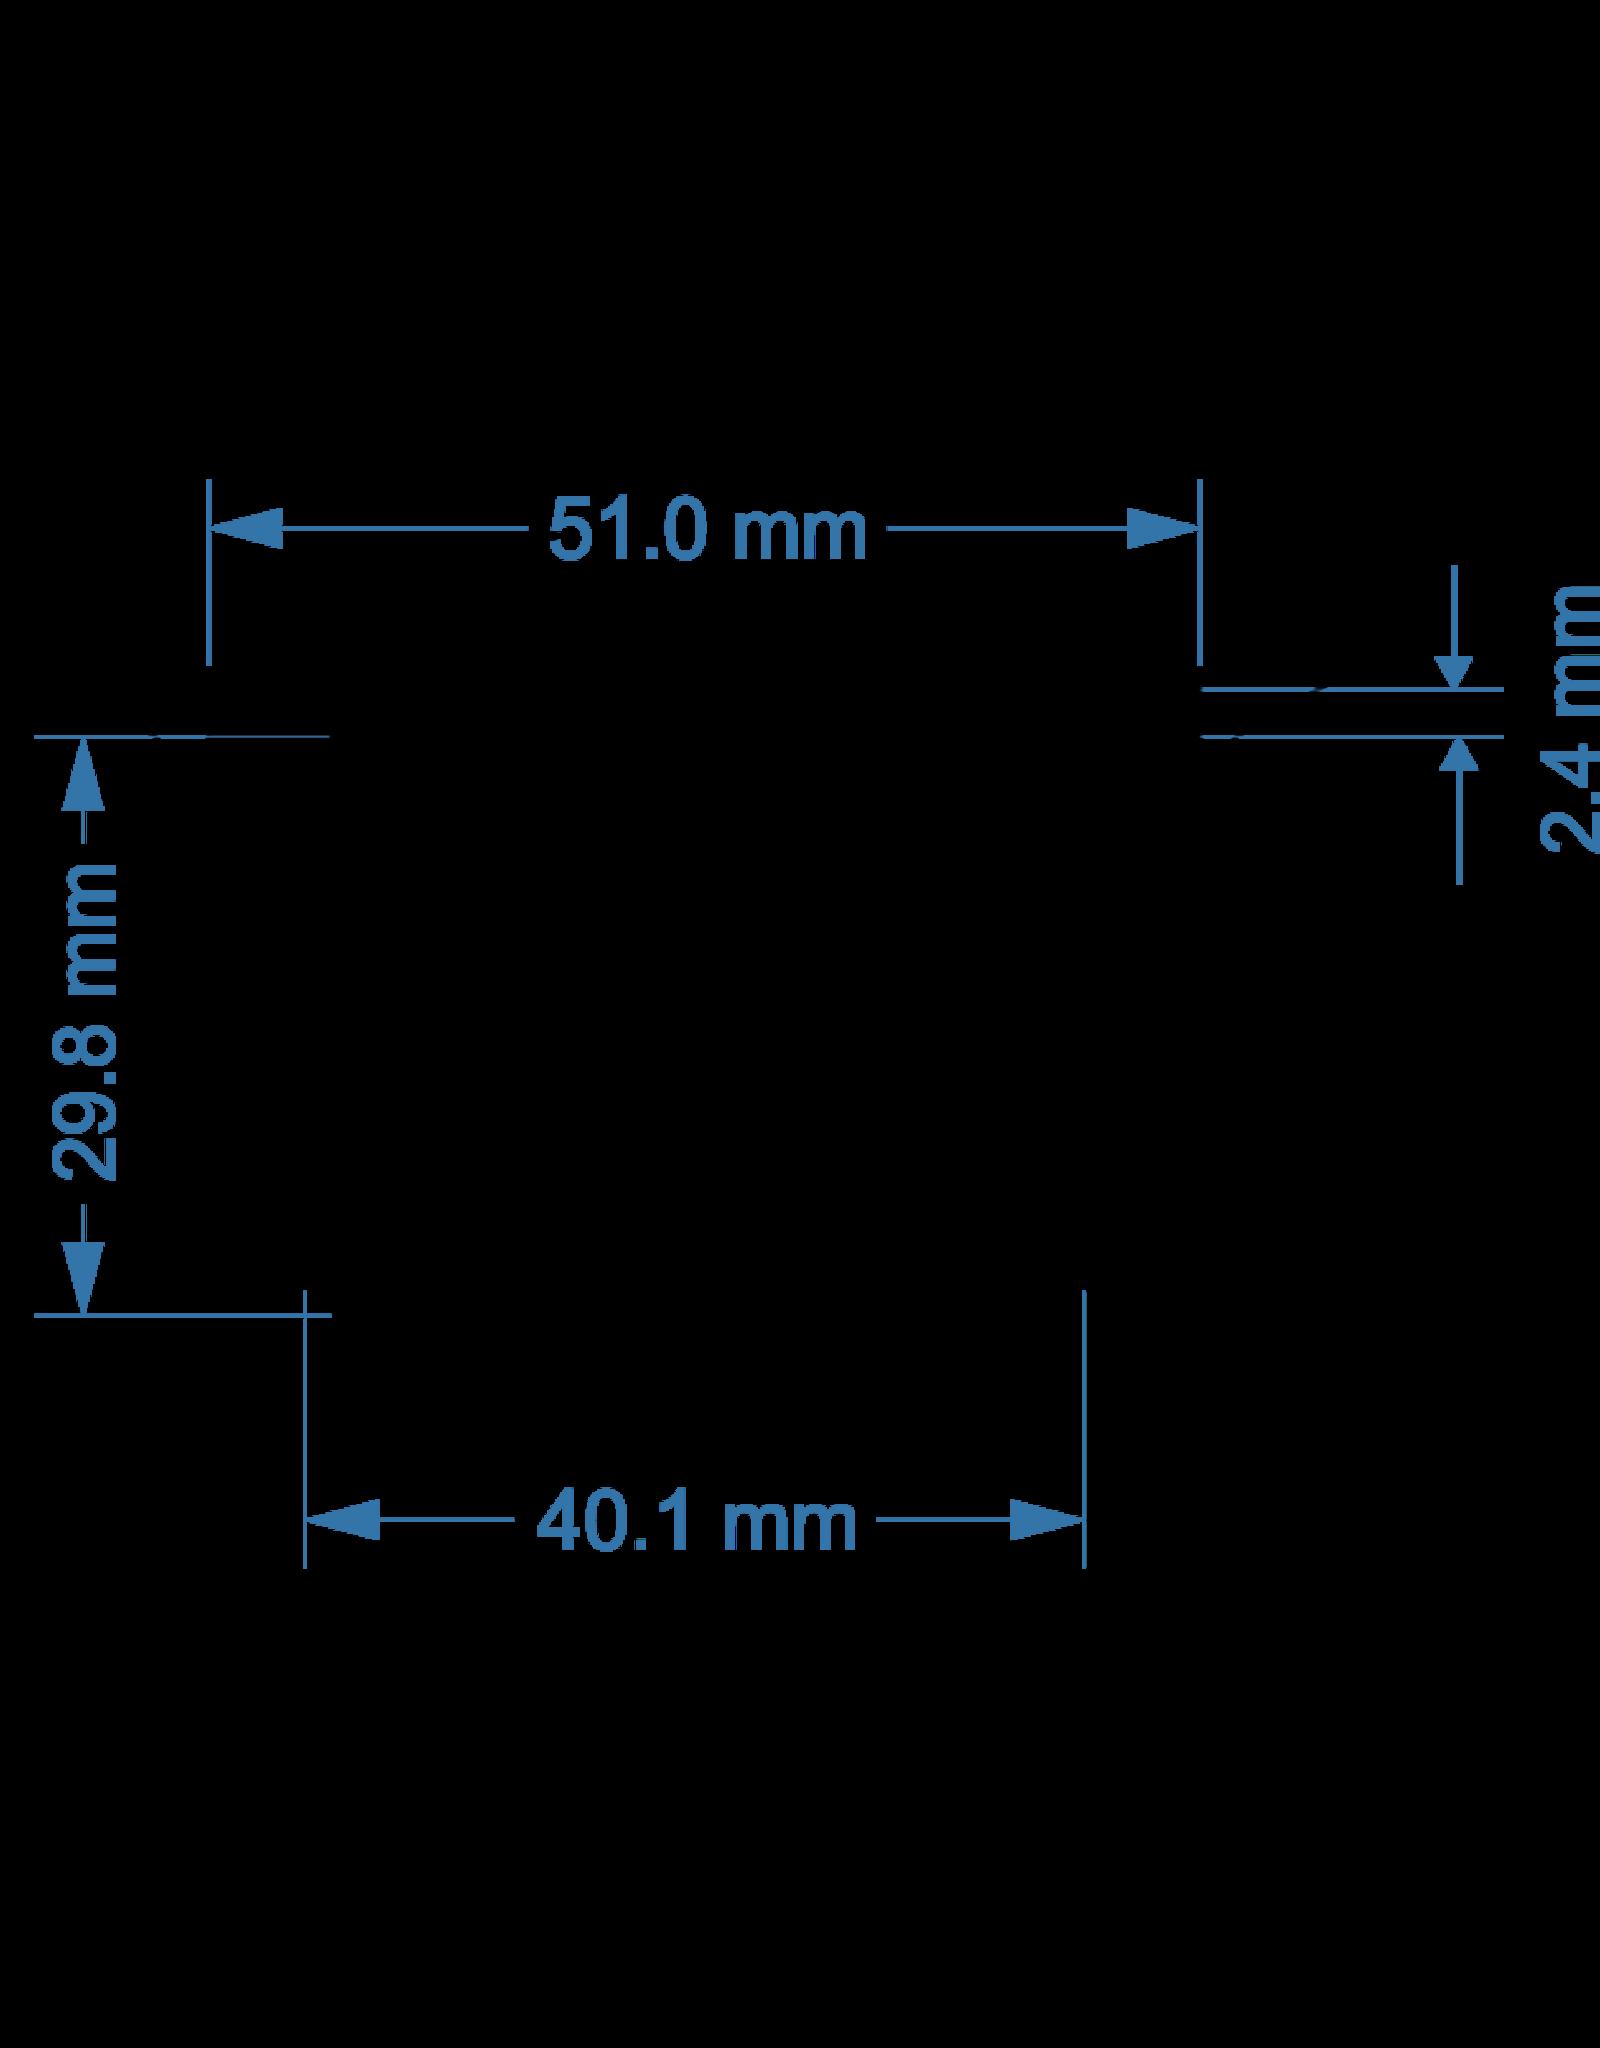 Larnitech CW-MLI-II - Sensor for motion, lighting and it's also an infrared emitter